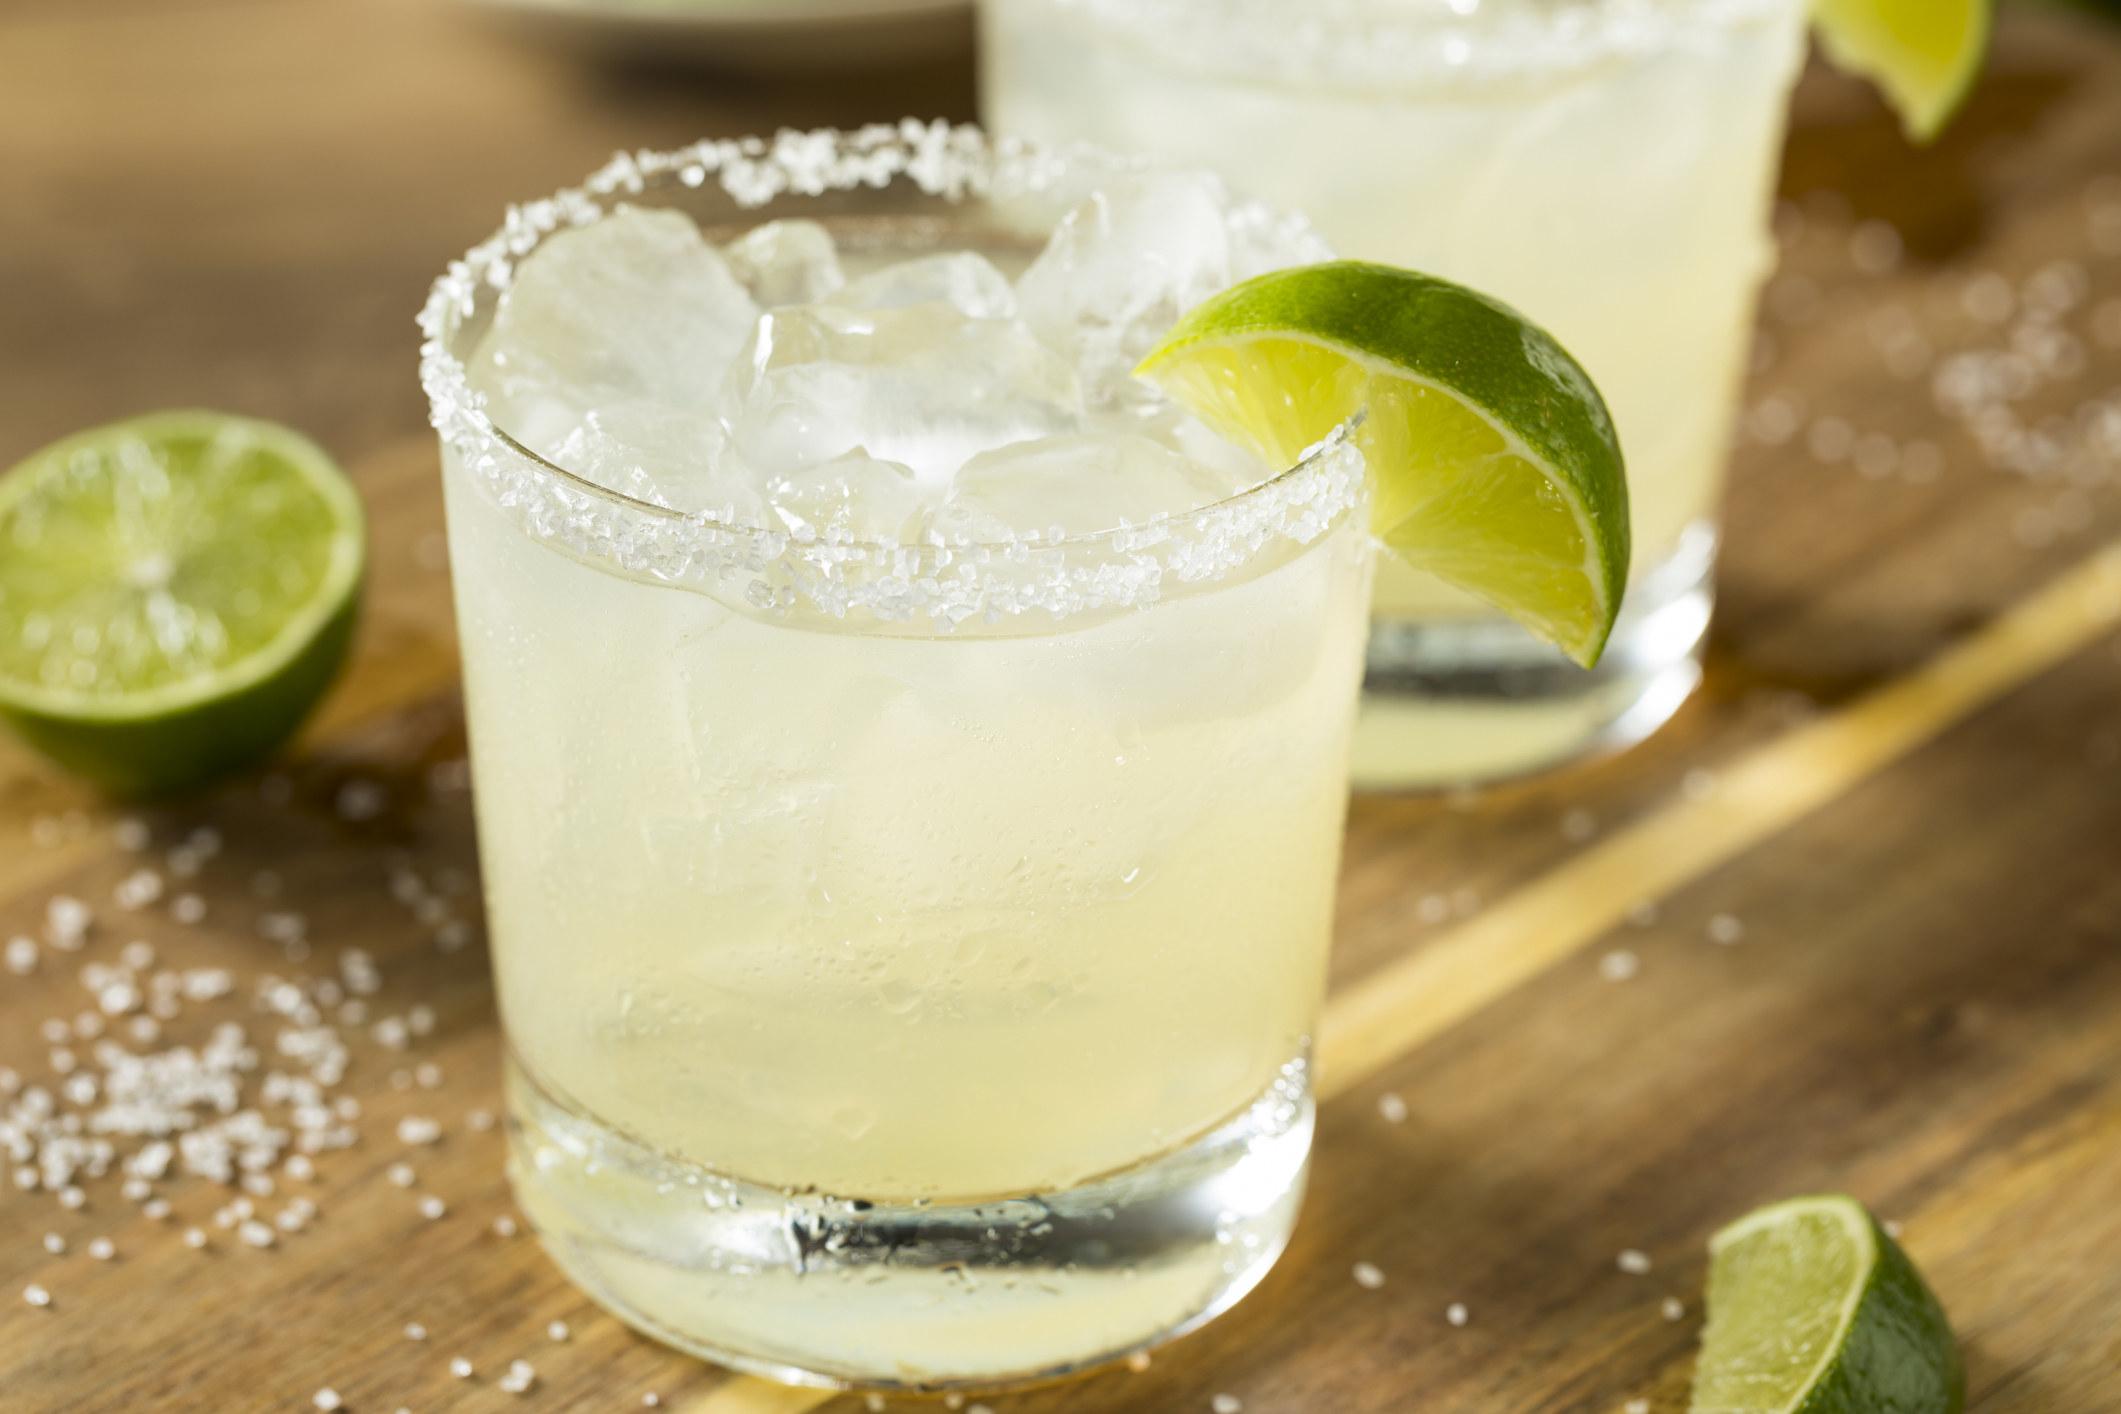 A Margarita with a salt rim.